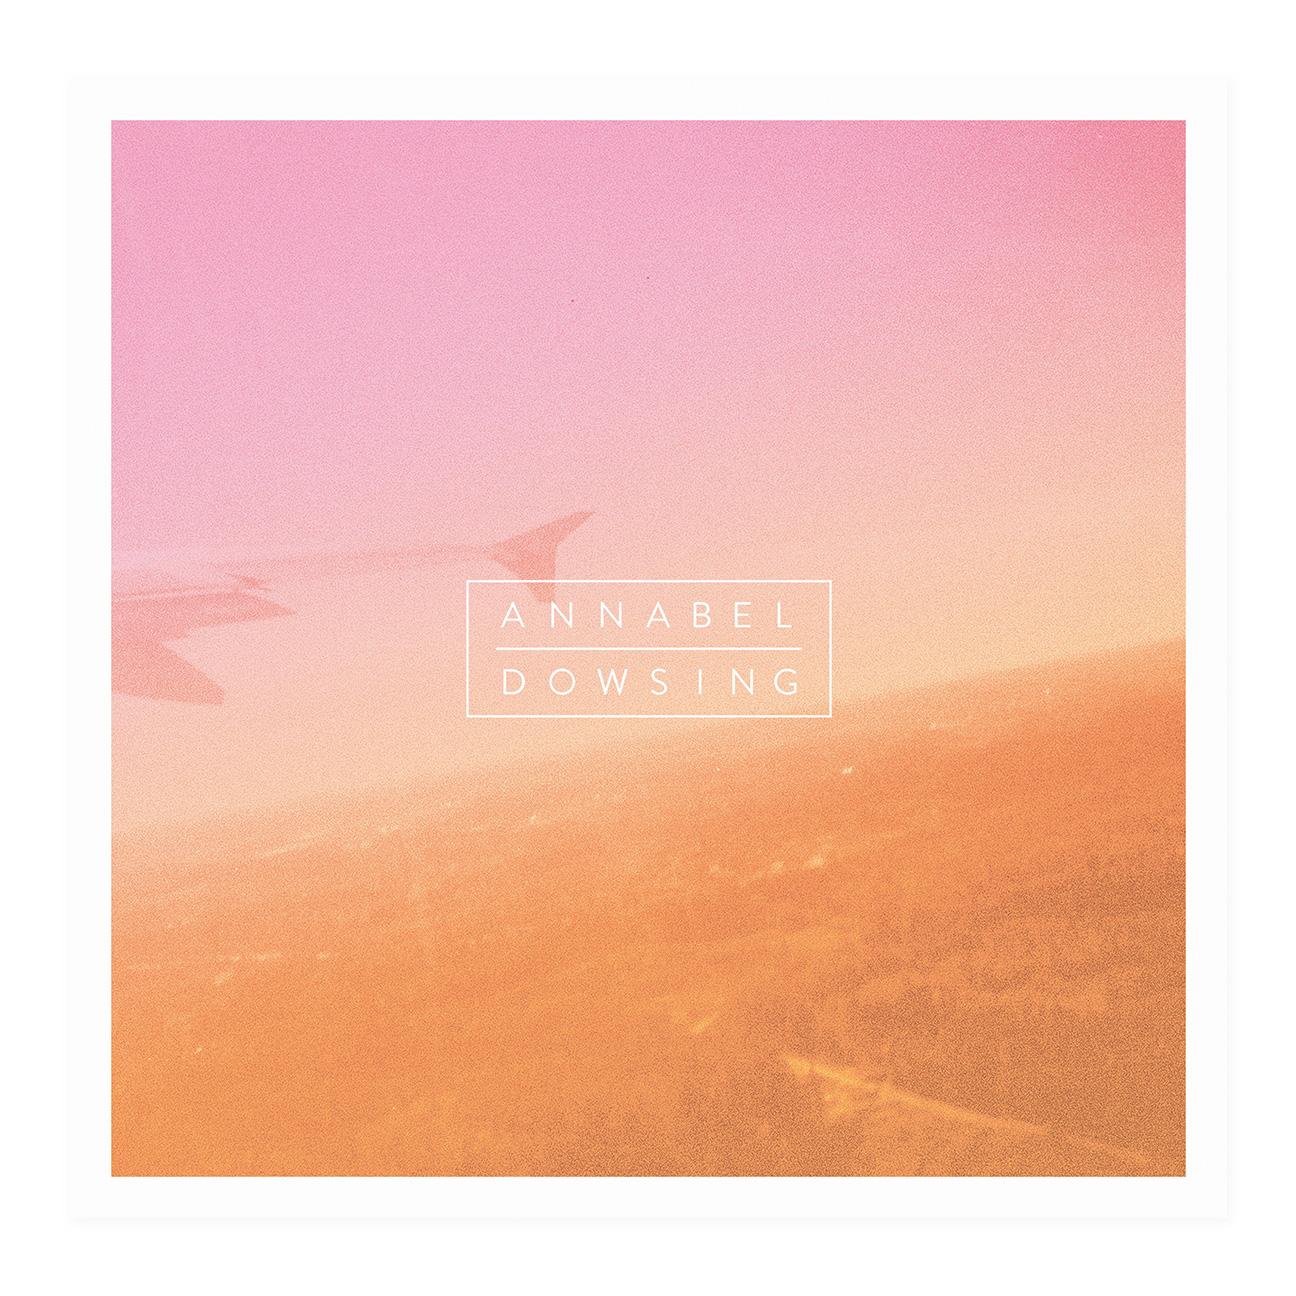 Album-Covers-Annabel-Dowsing.jpg